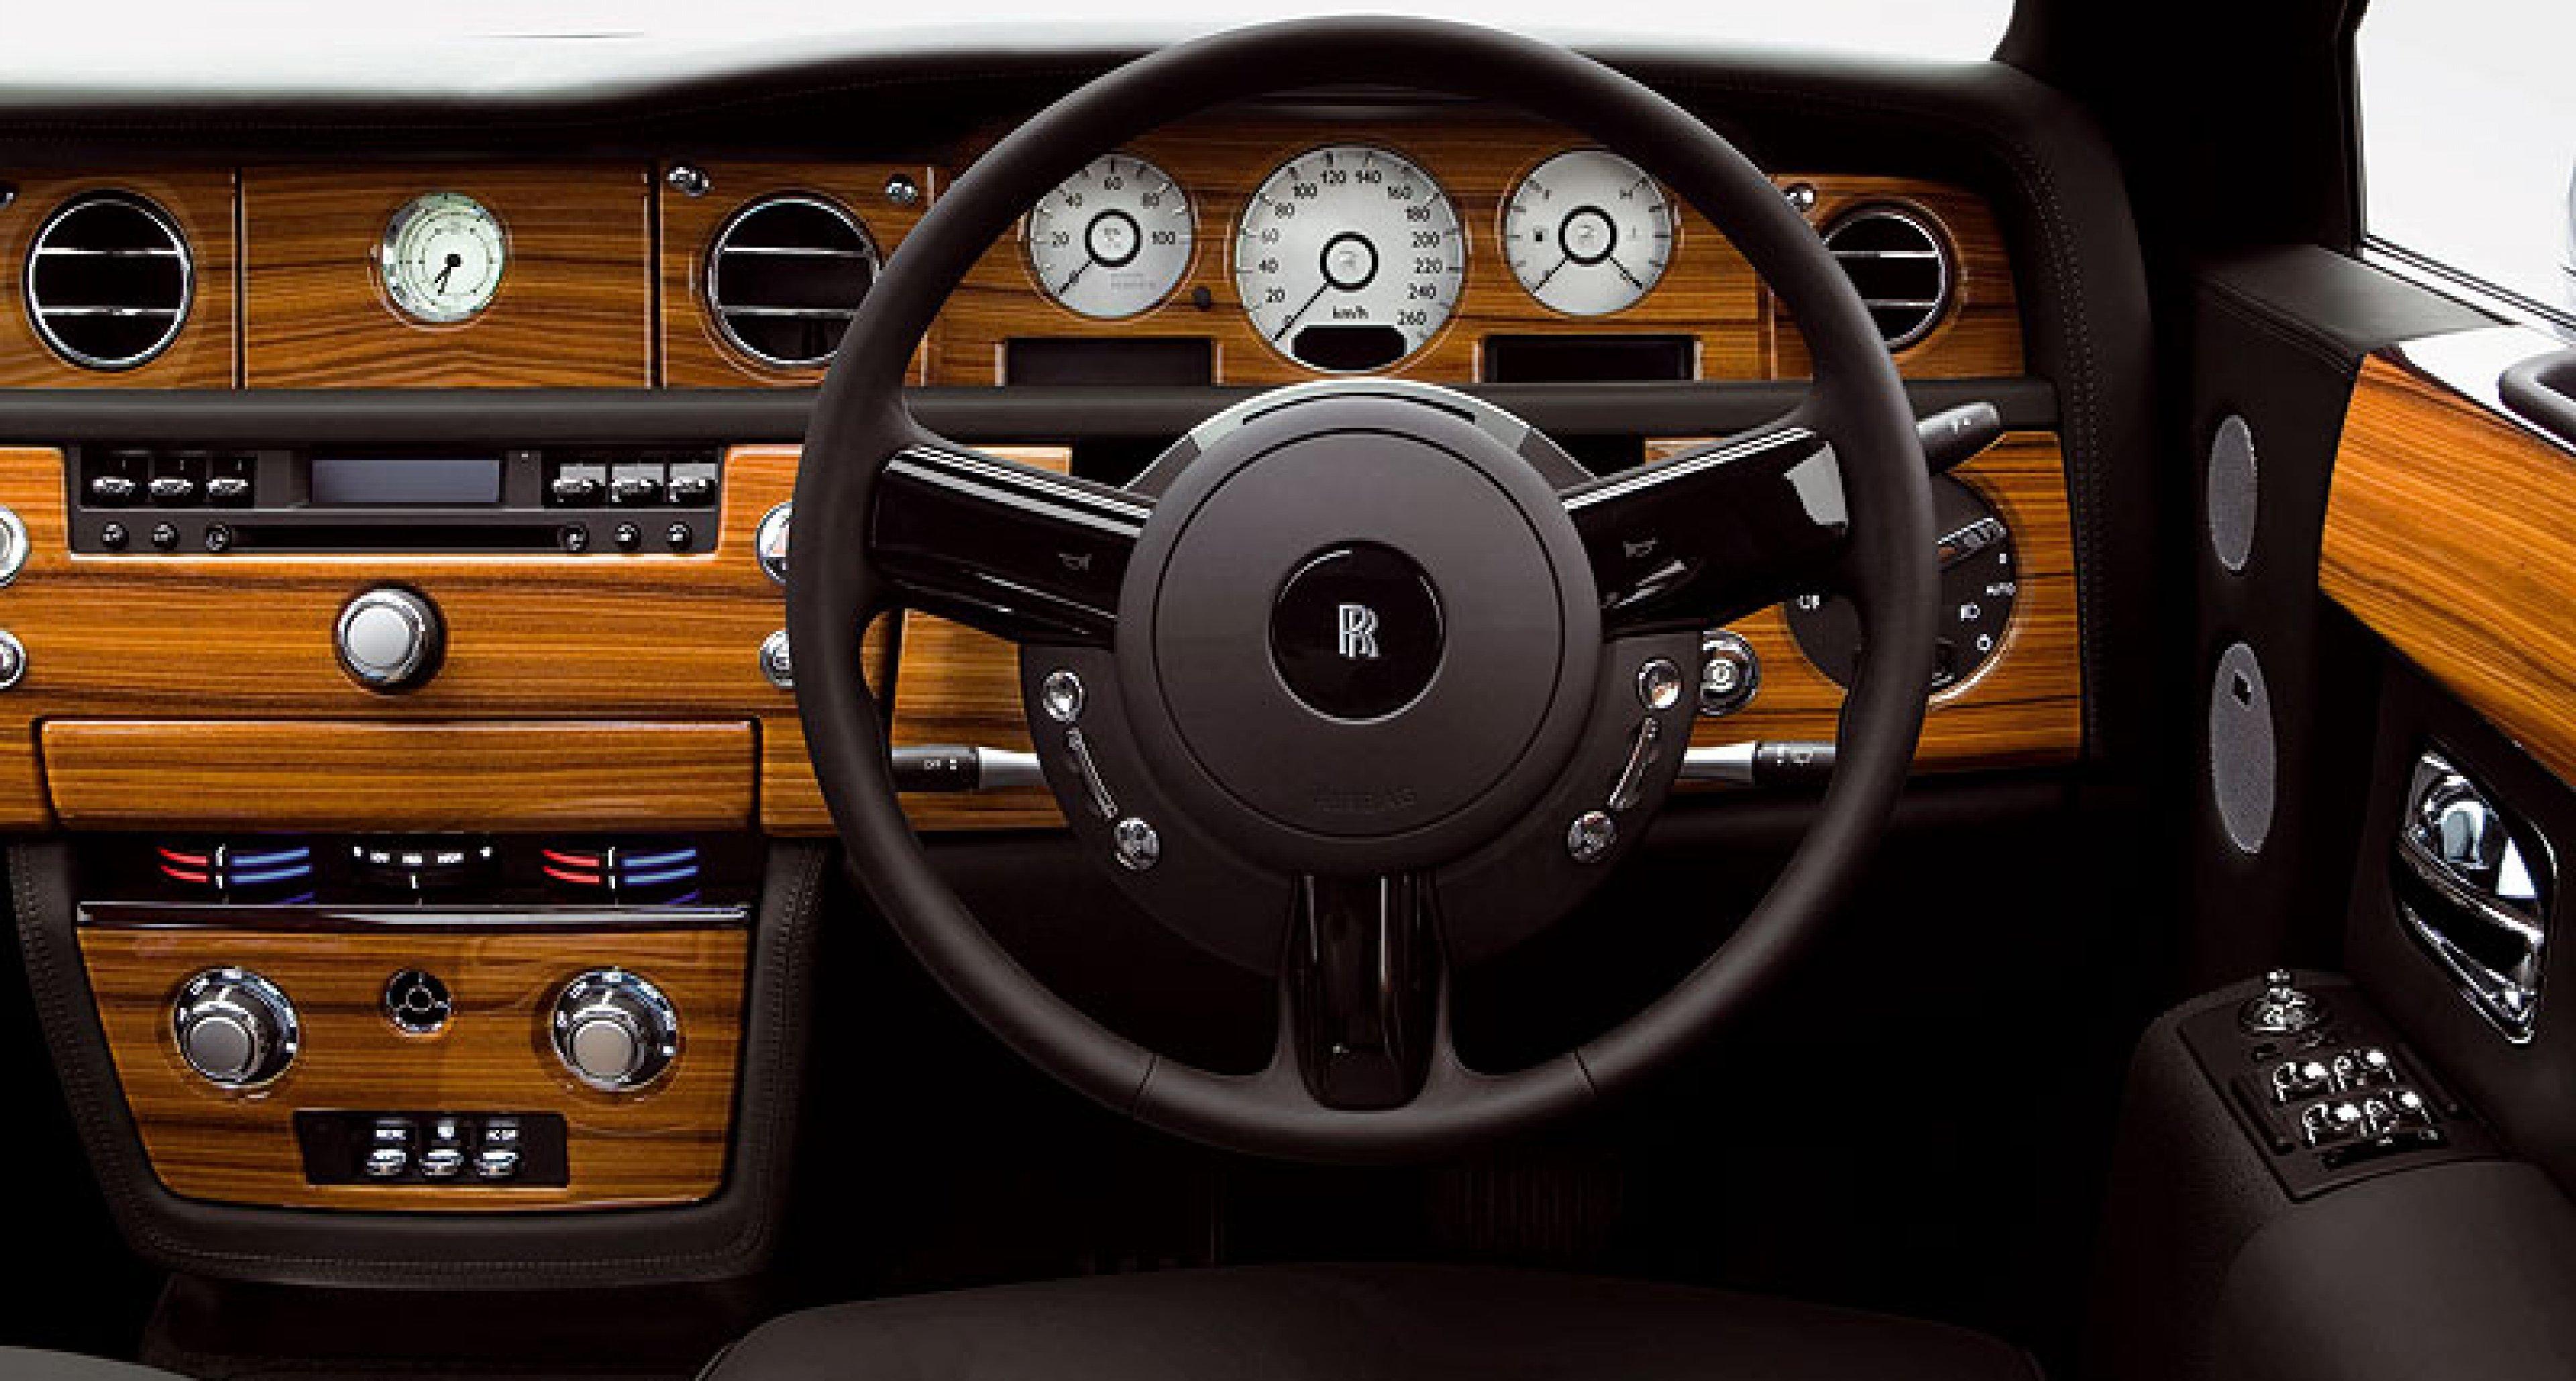 Rolls-Royce produces the Phantom Silver